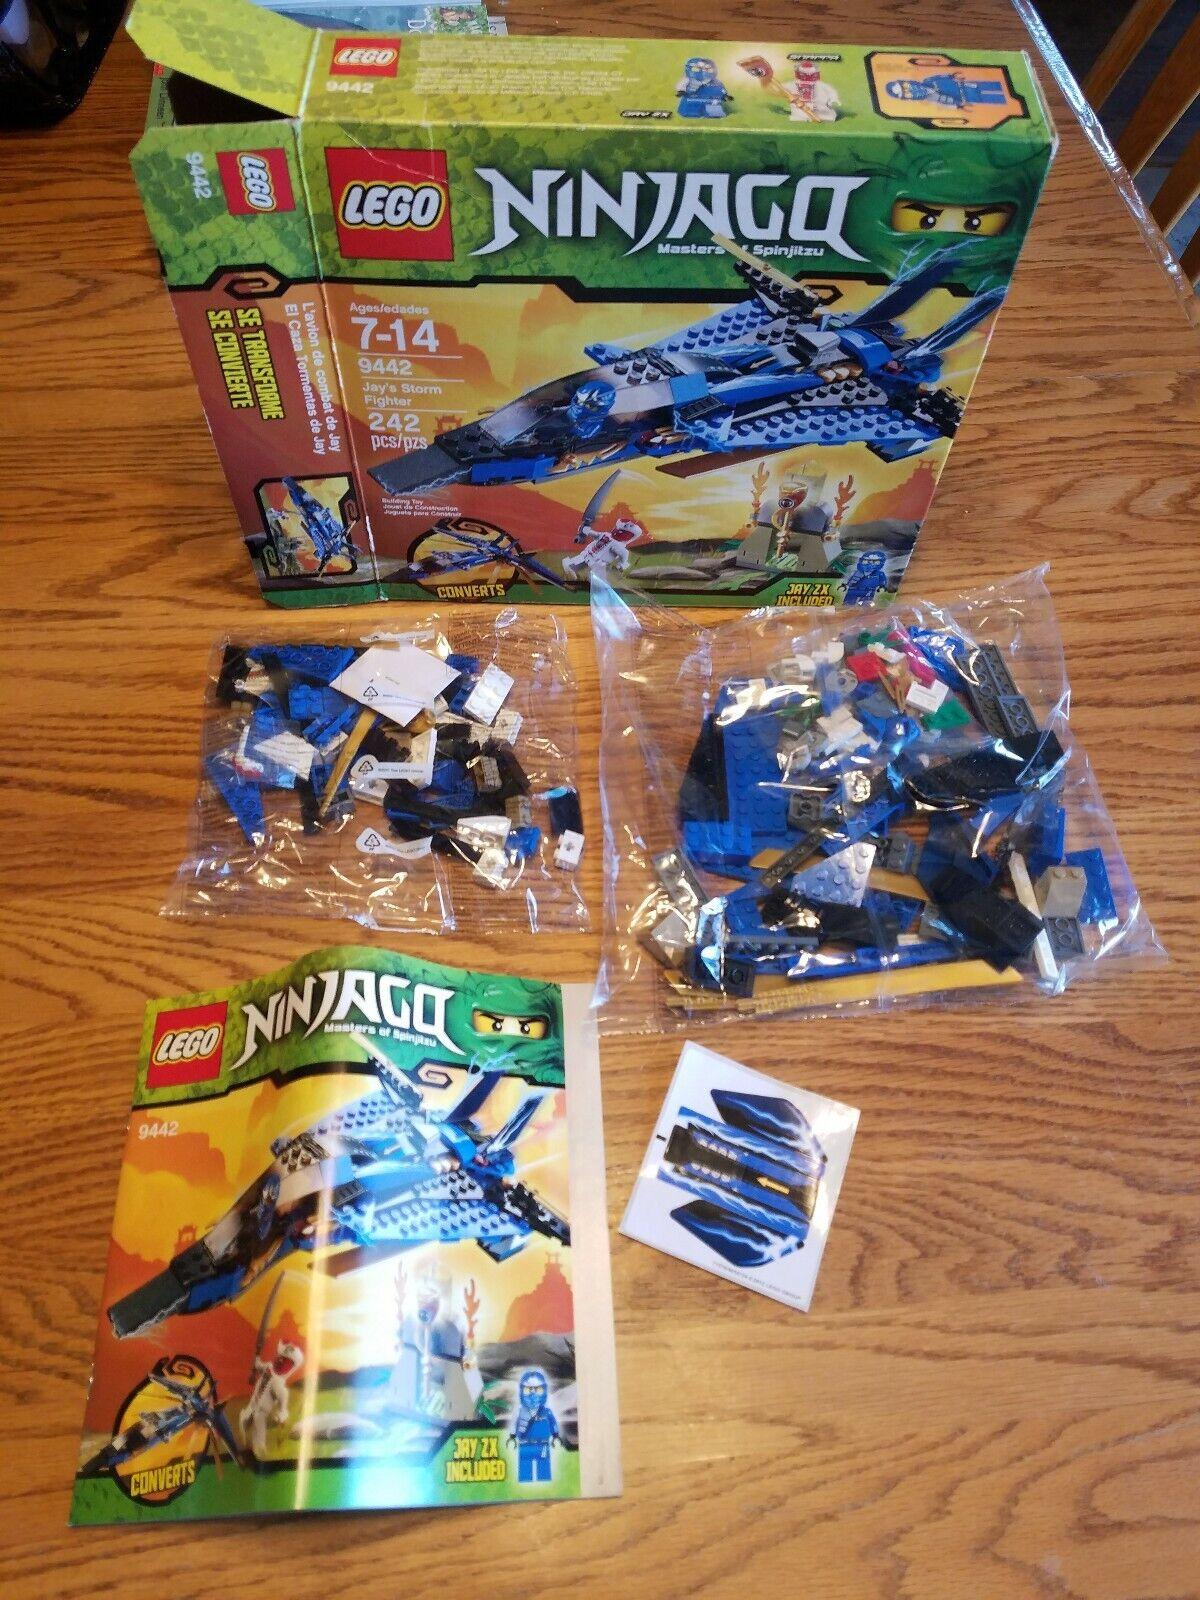 Lego Ninjago Jay's Storm Fighter (9442), new in box